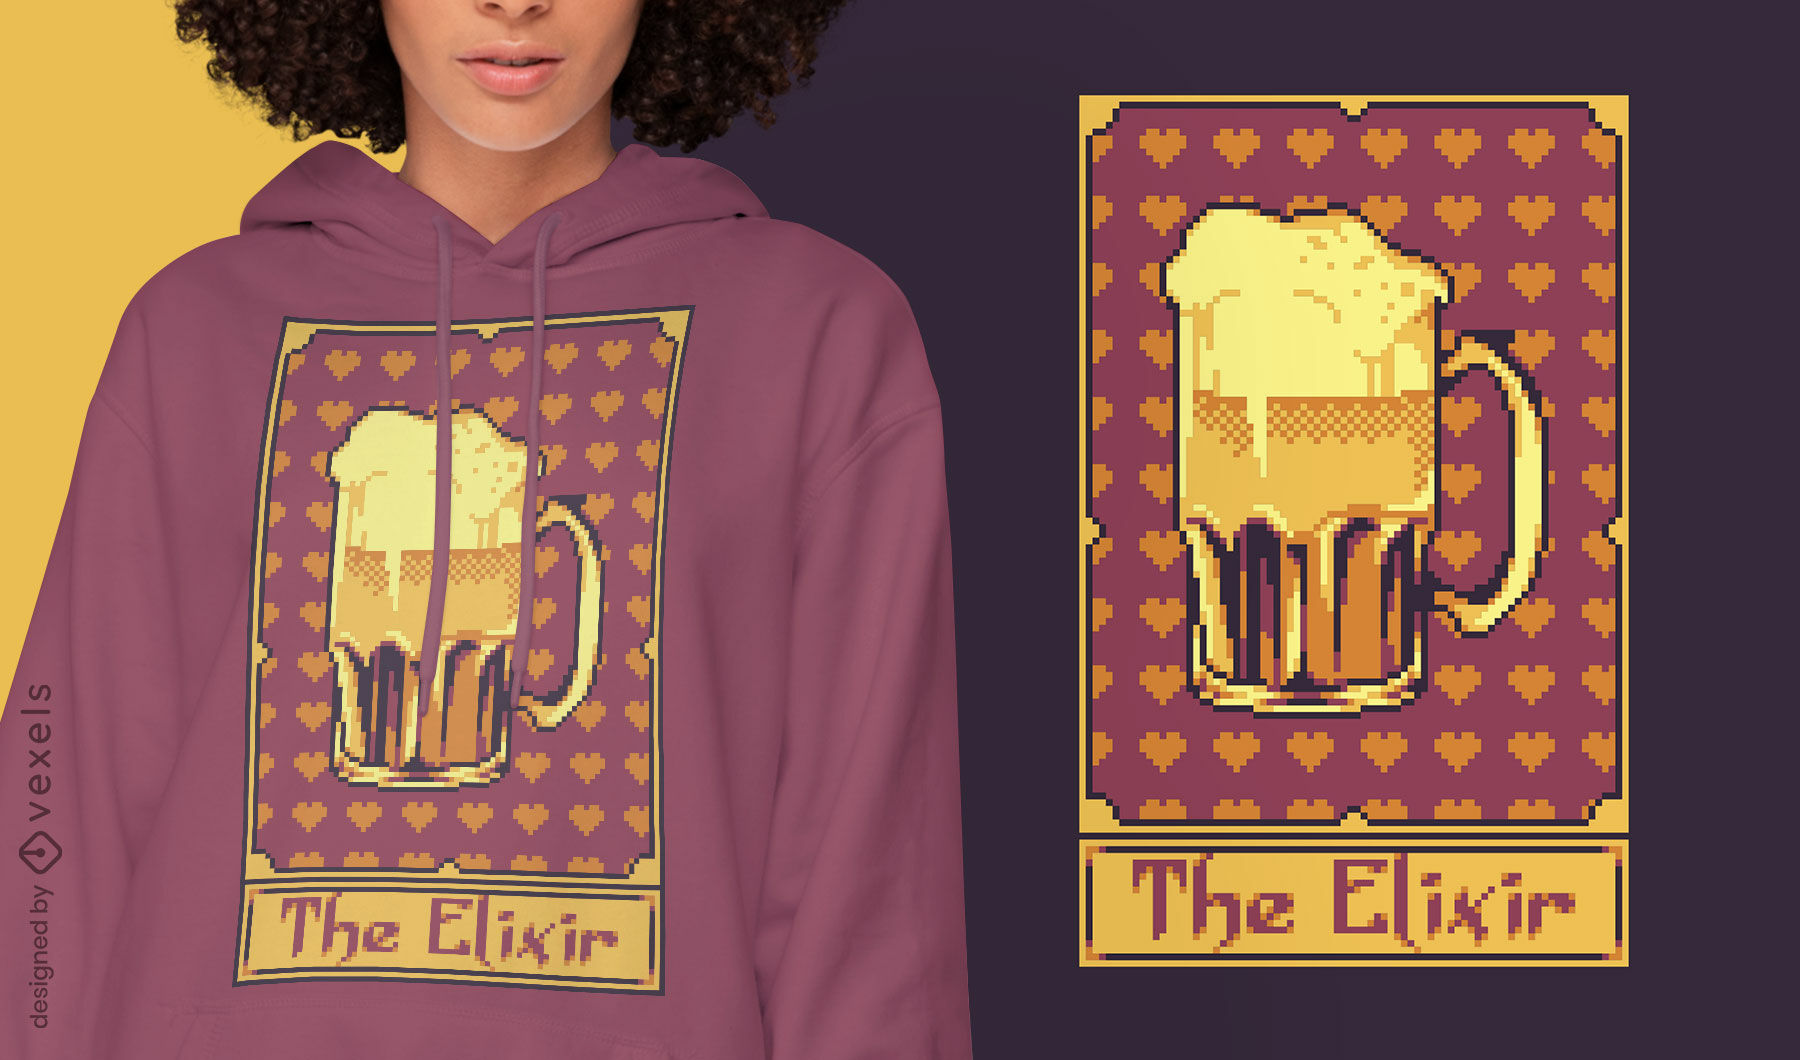 Pixel tarot card beer drink t-shirt design